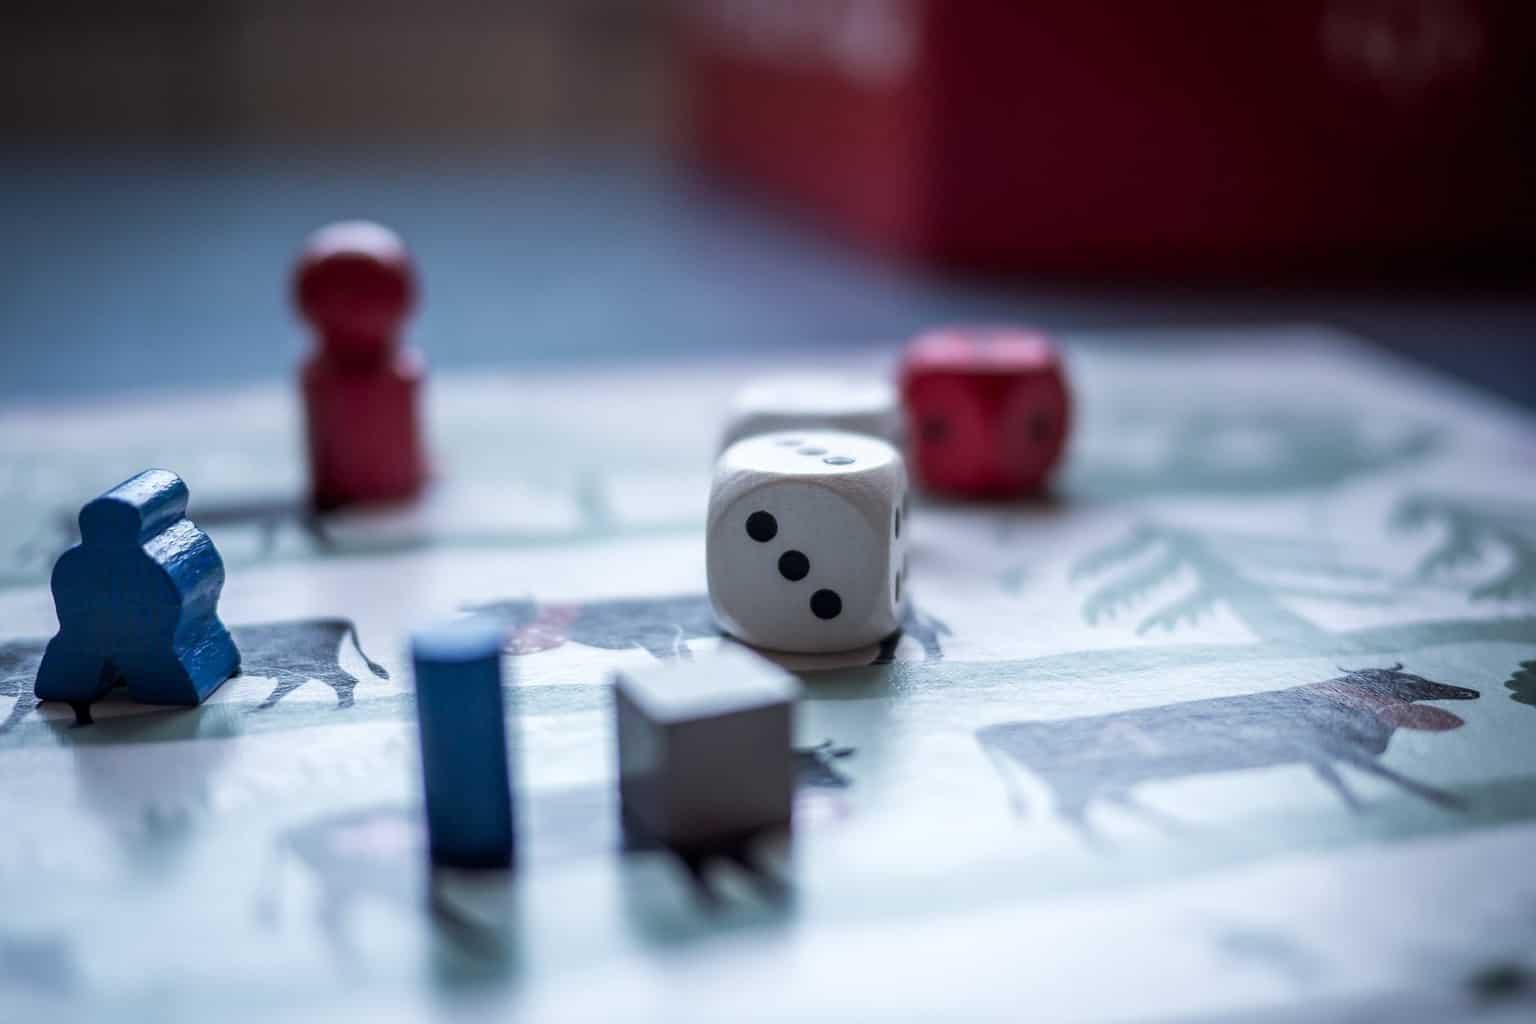 Make a board game